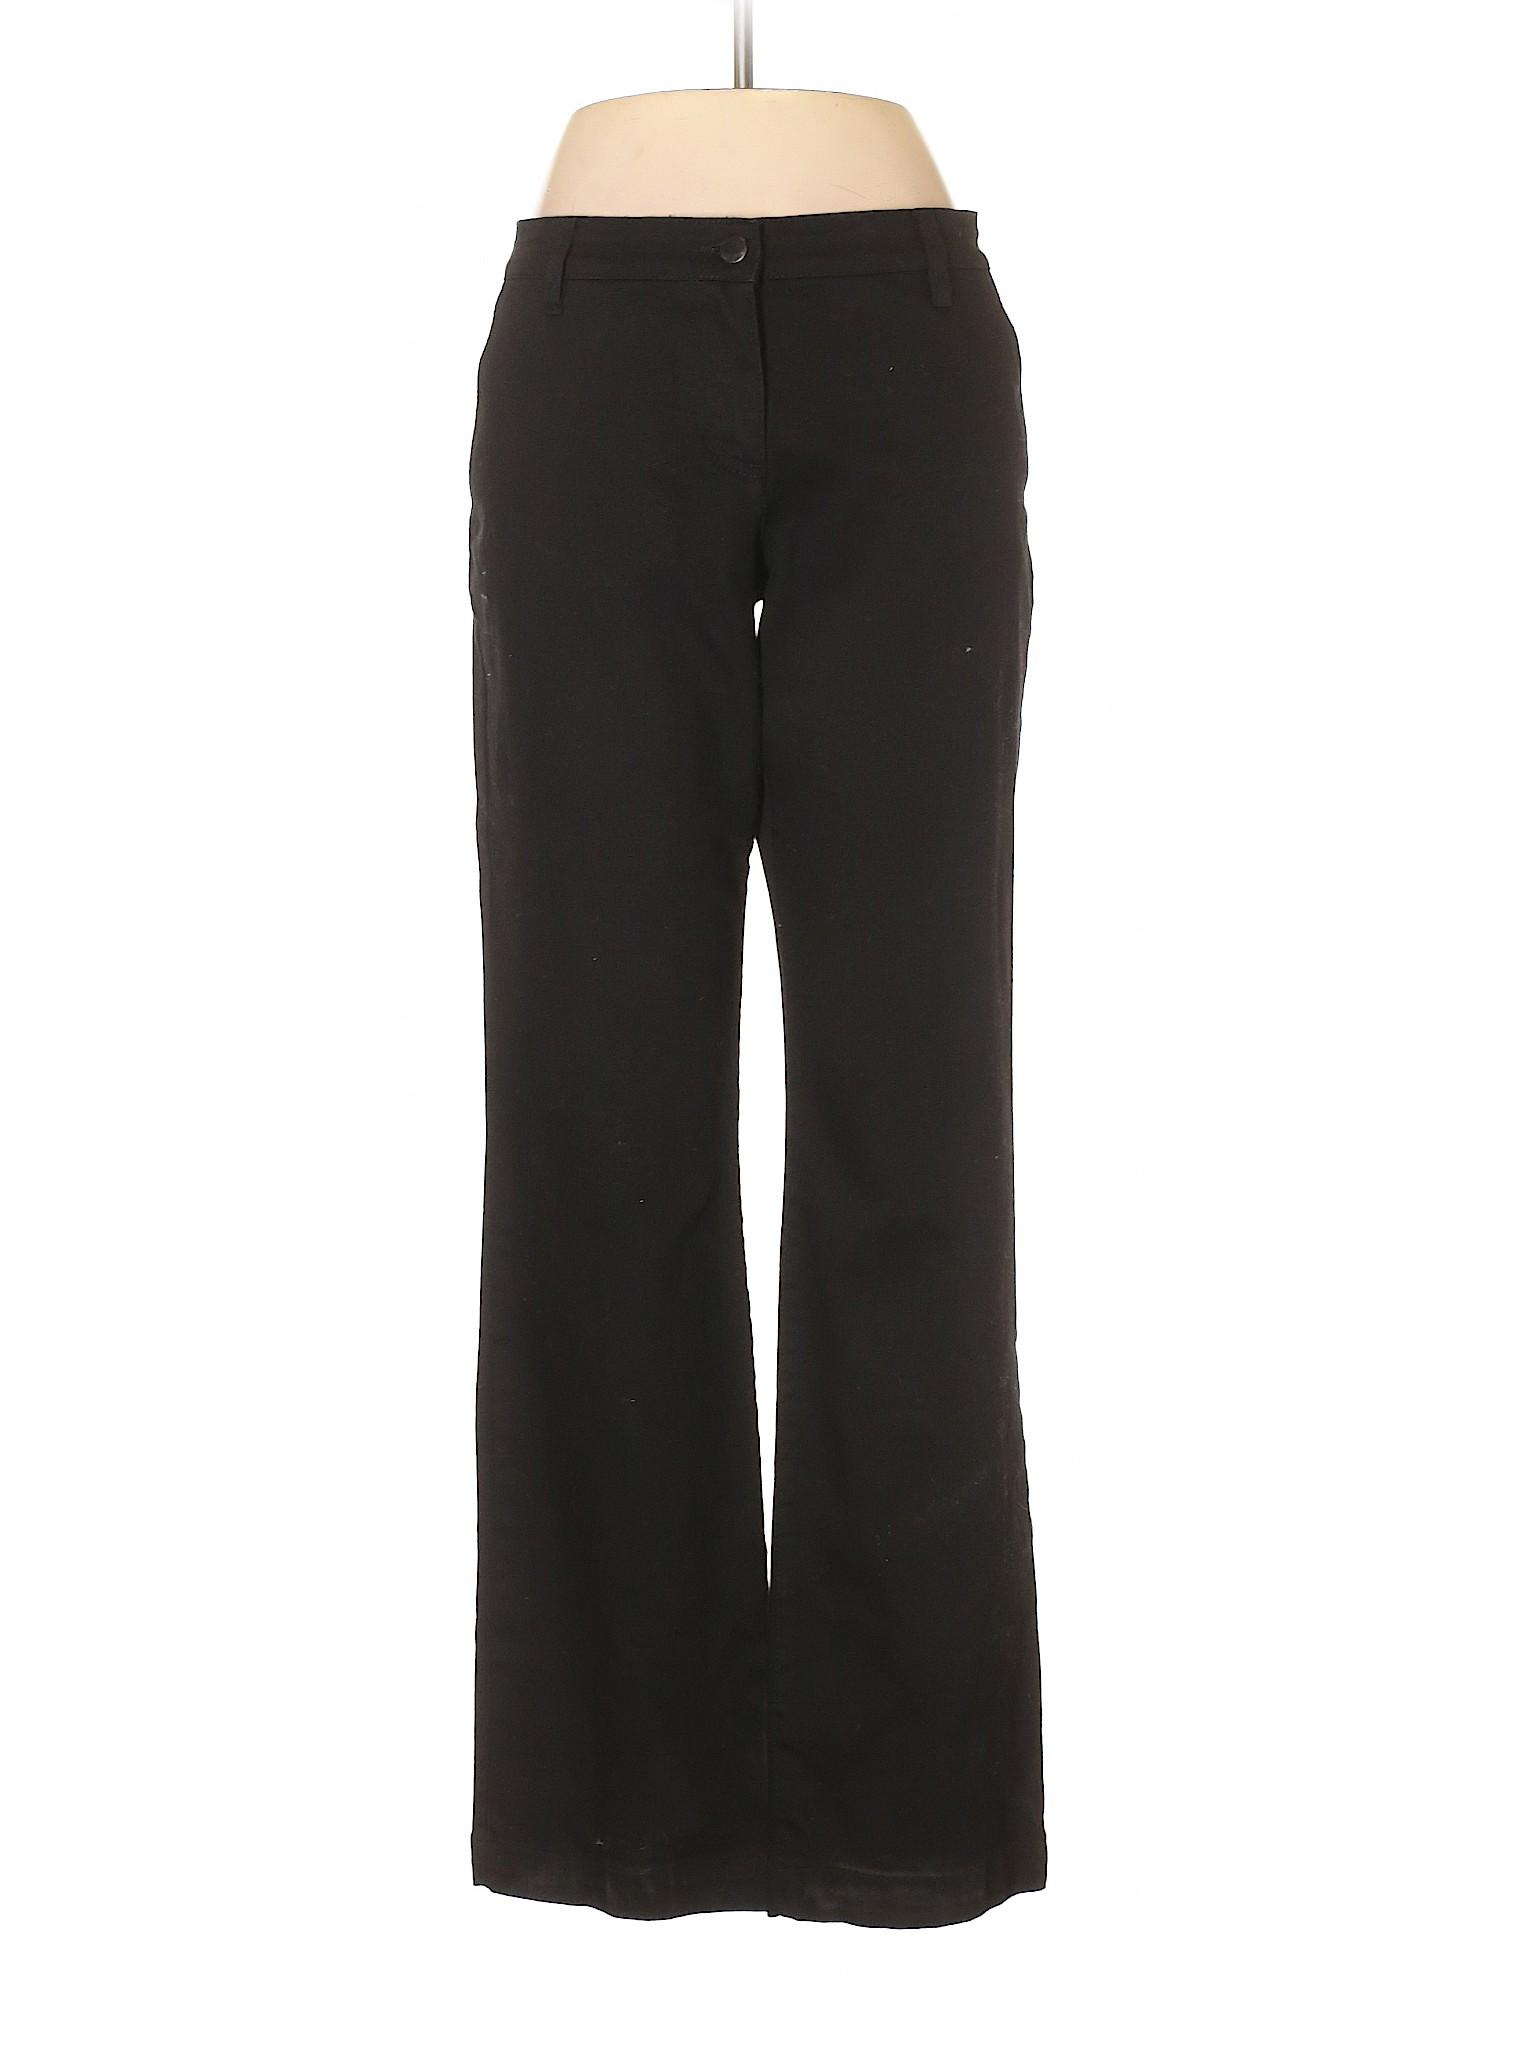 Eileen leisure Dress Fisher Pants Boutique 41xHwF5qF